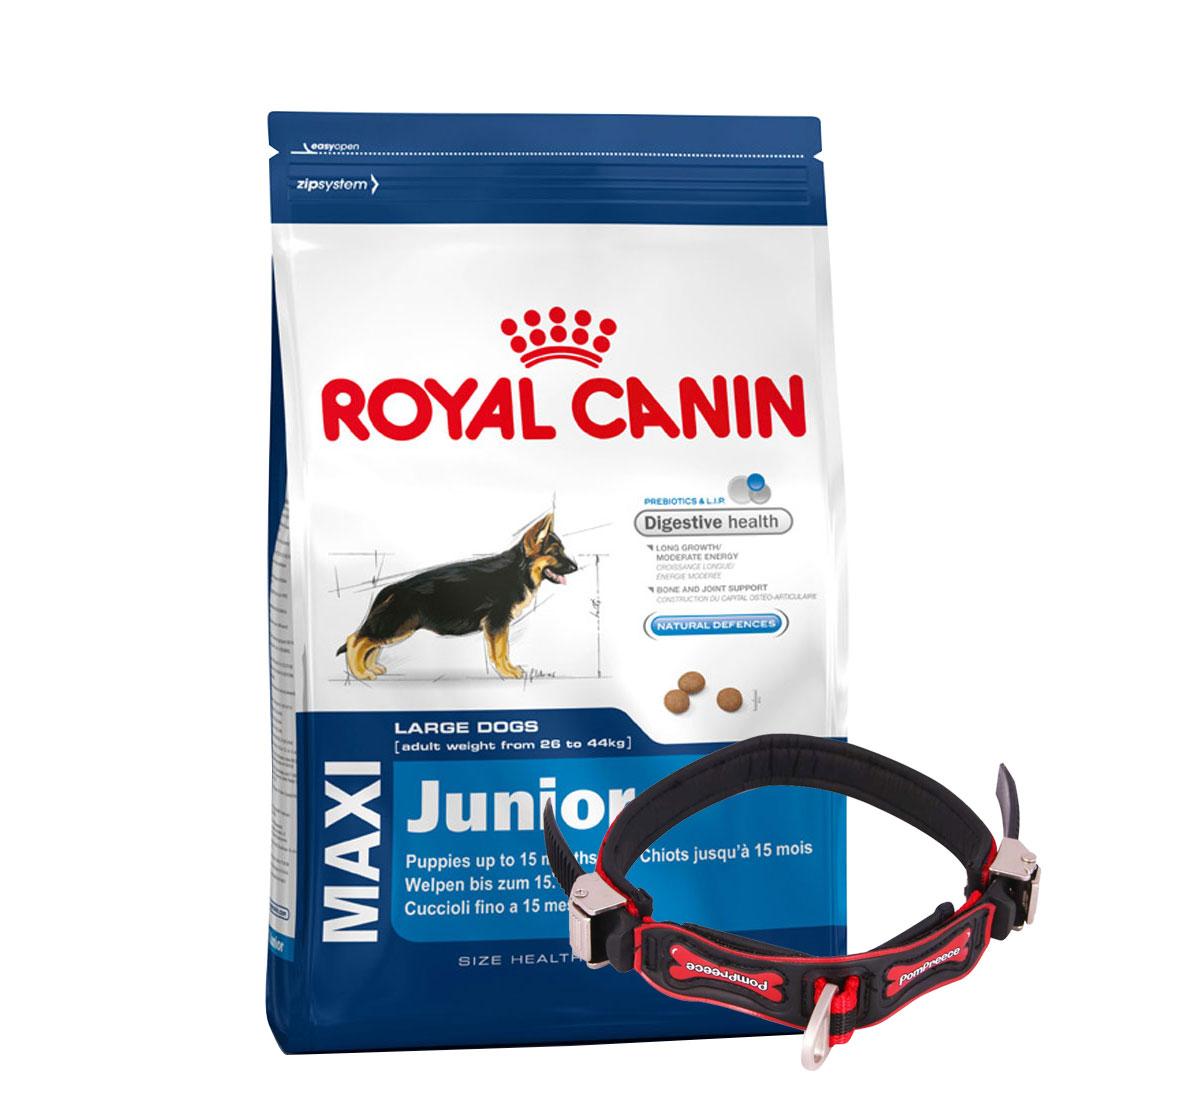 royal canin maxi junior 4 kg with ergocomfort dog collar. Black Bedroom Furniture Sets. Home Design Ideas